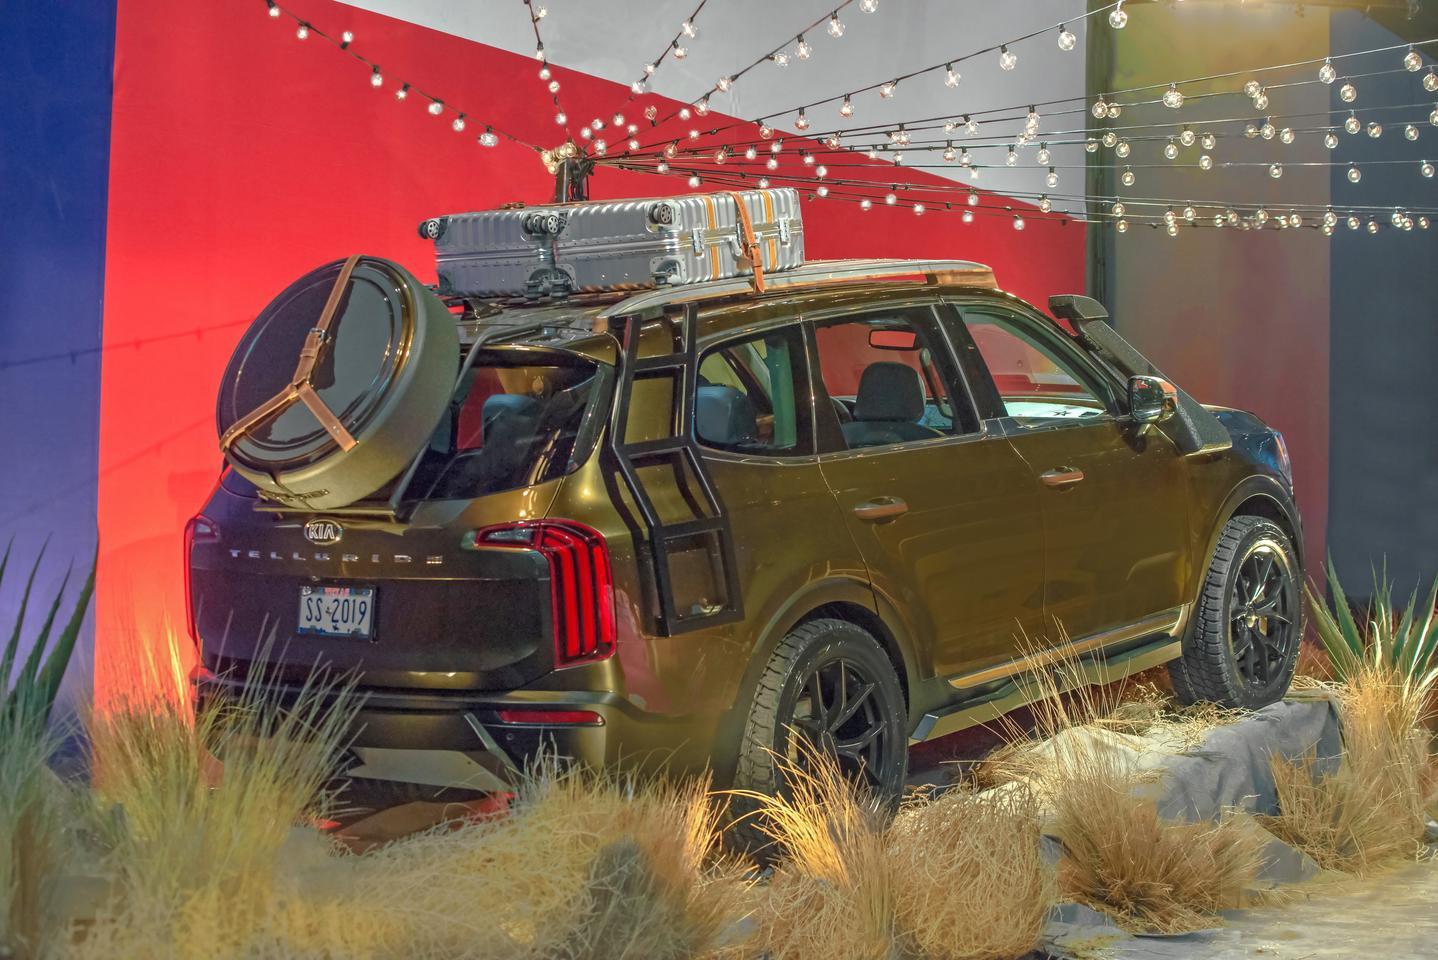 Kia's collaboration Telluride looks like it's ready to go overlanding across the Rockies